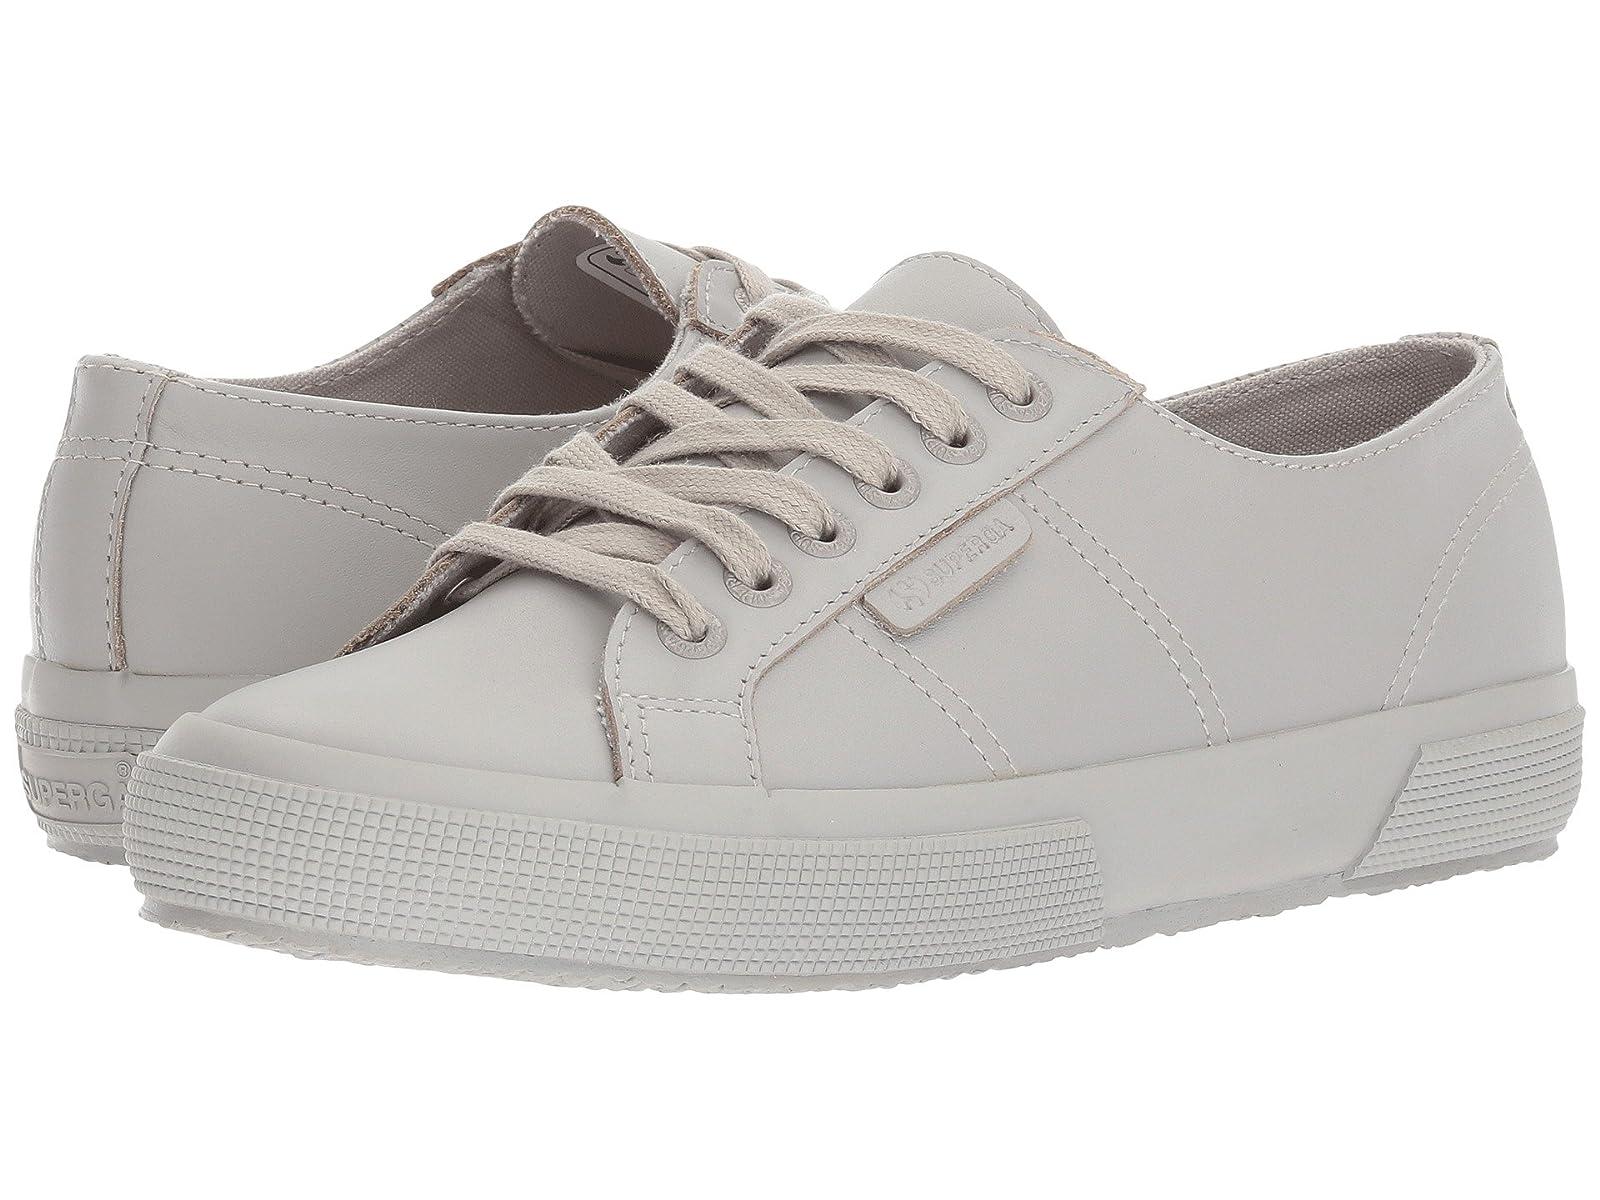 Superga 2750 FGLU SneakerCheap and distinctive eye-catching shoes